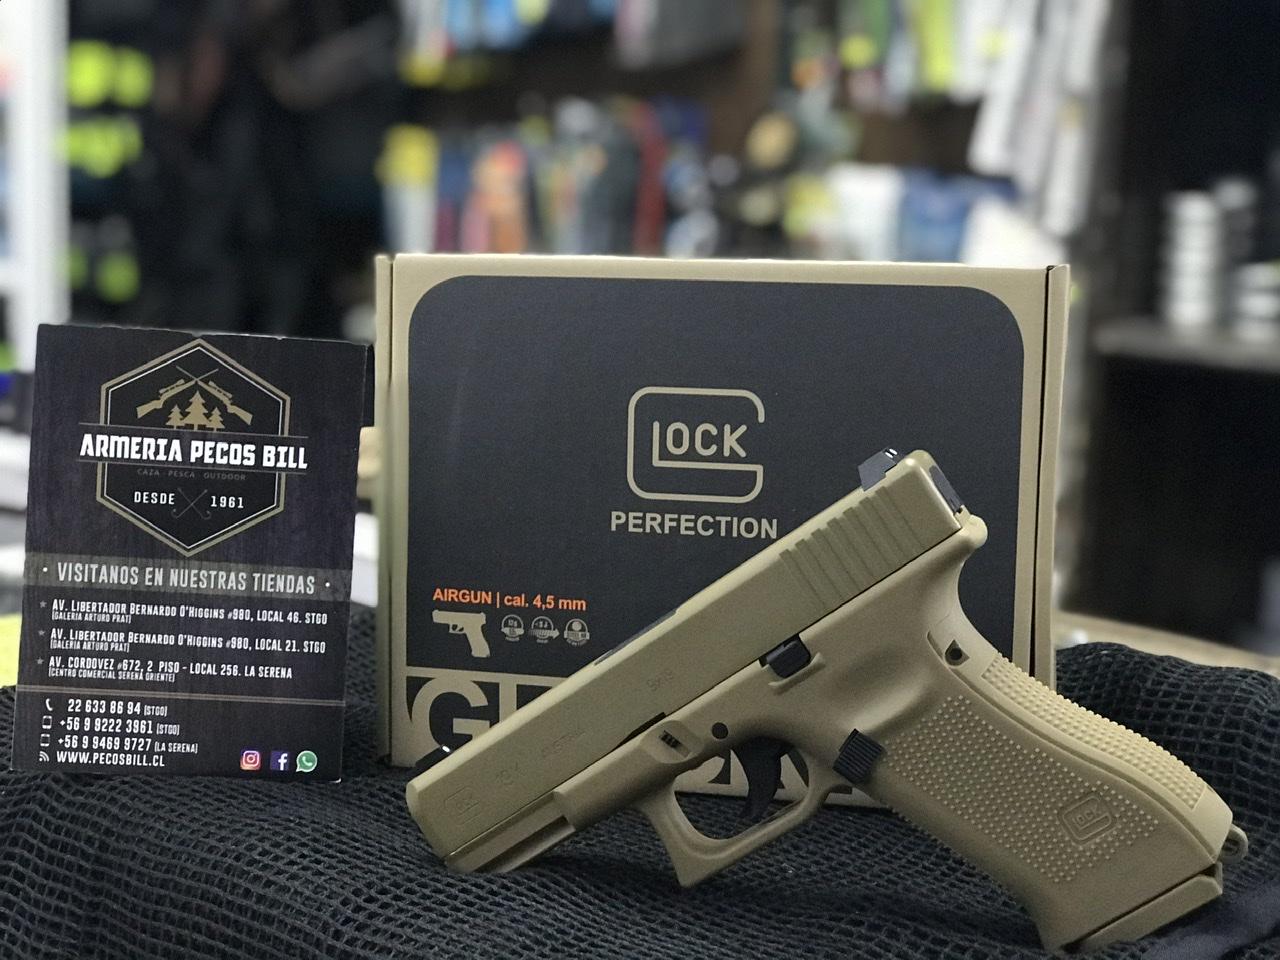 Pistola Umarex Glock 19X cal 4,5 bbs co2